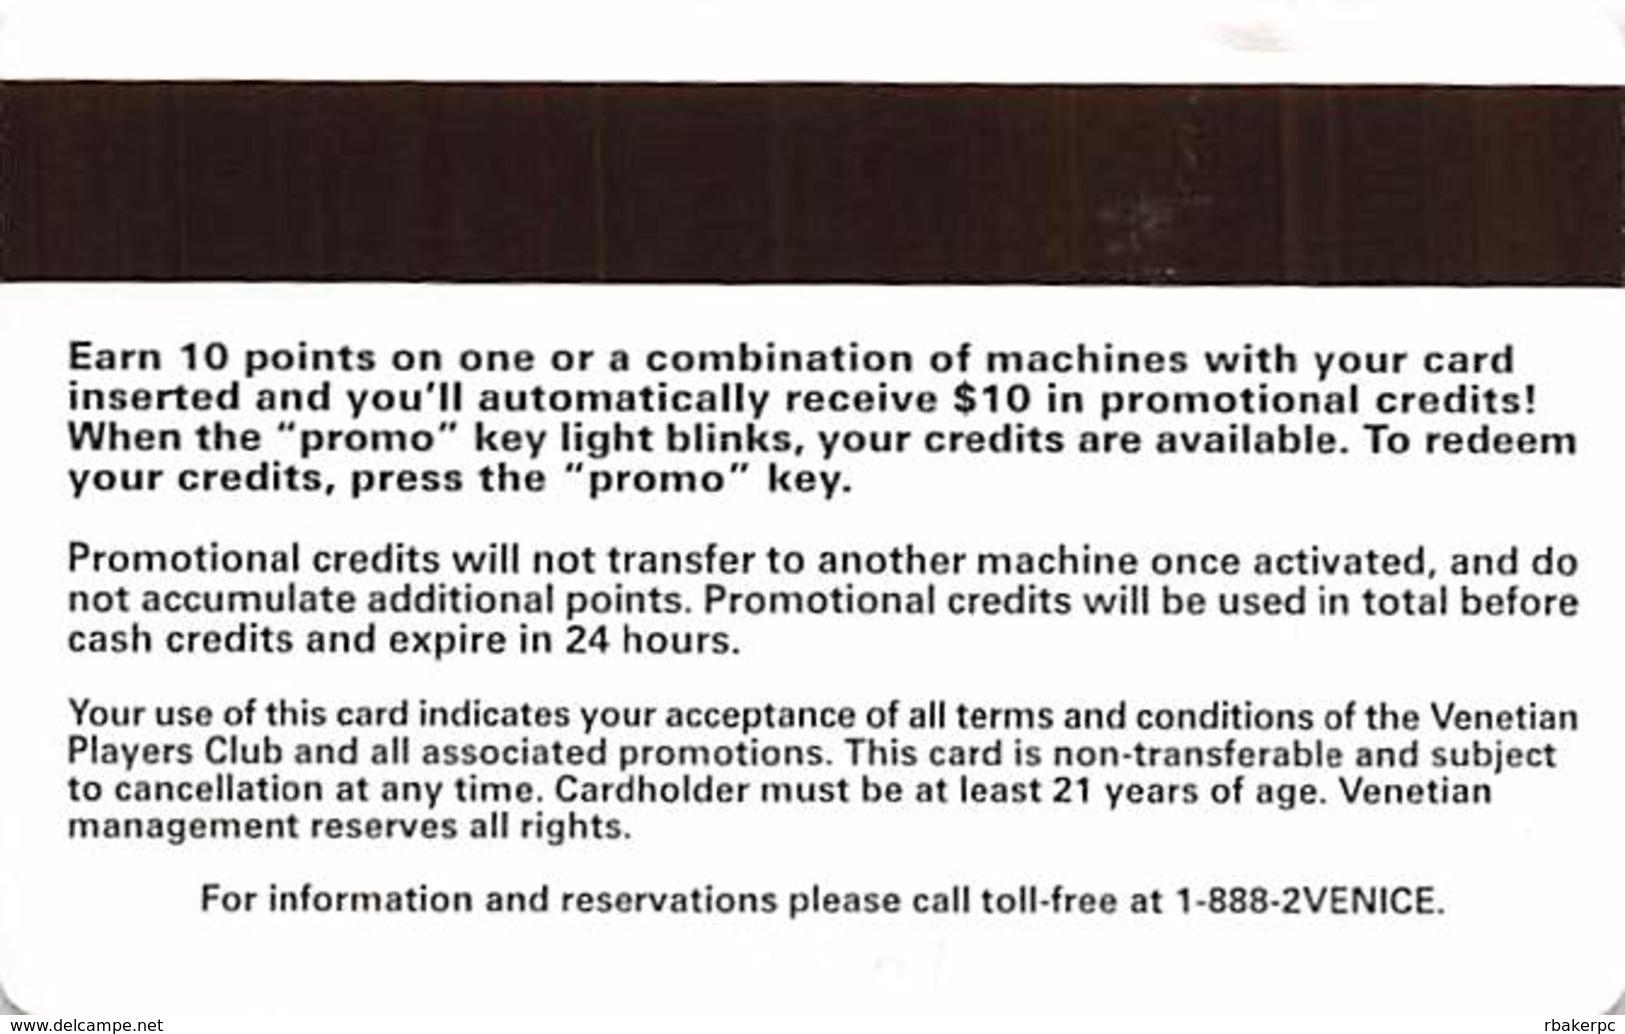 Venetian Casino - Las Vegas, NV - Paper Players Club - Earn 10 Points - Get $10 - Casino Cards